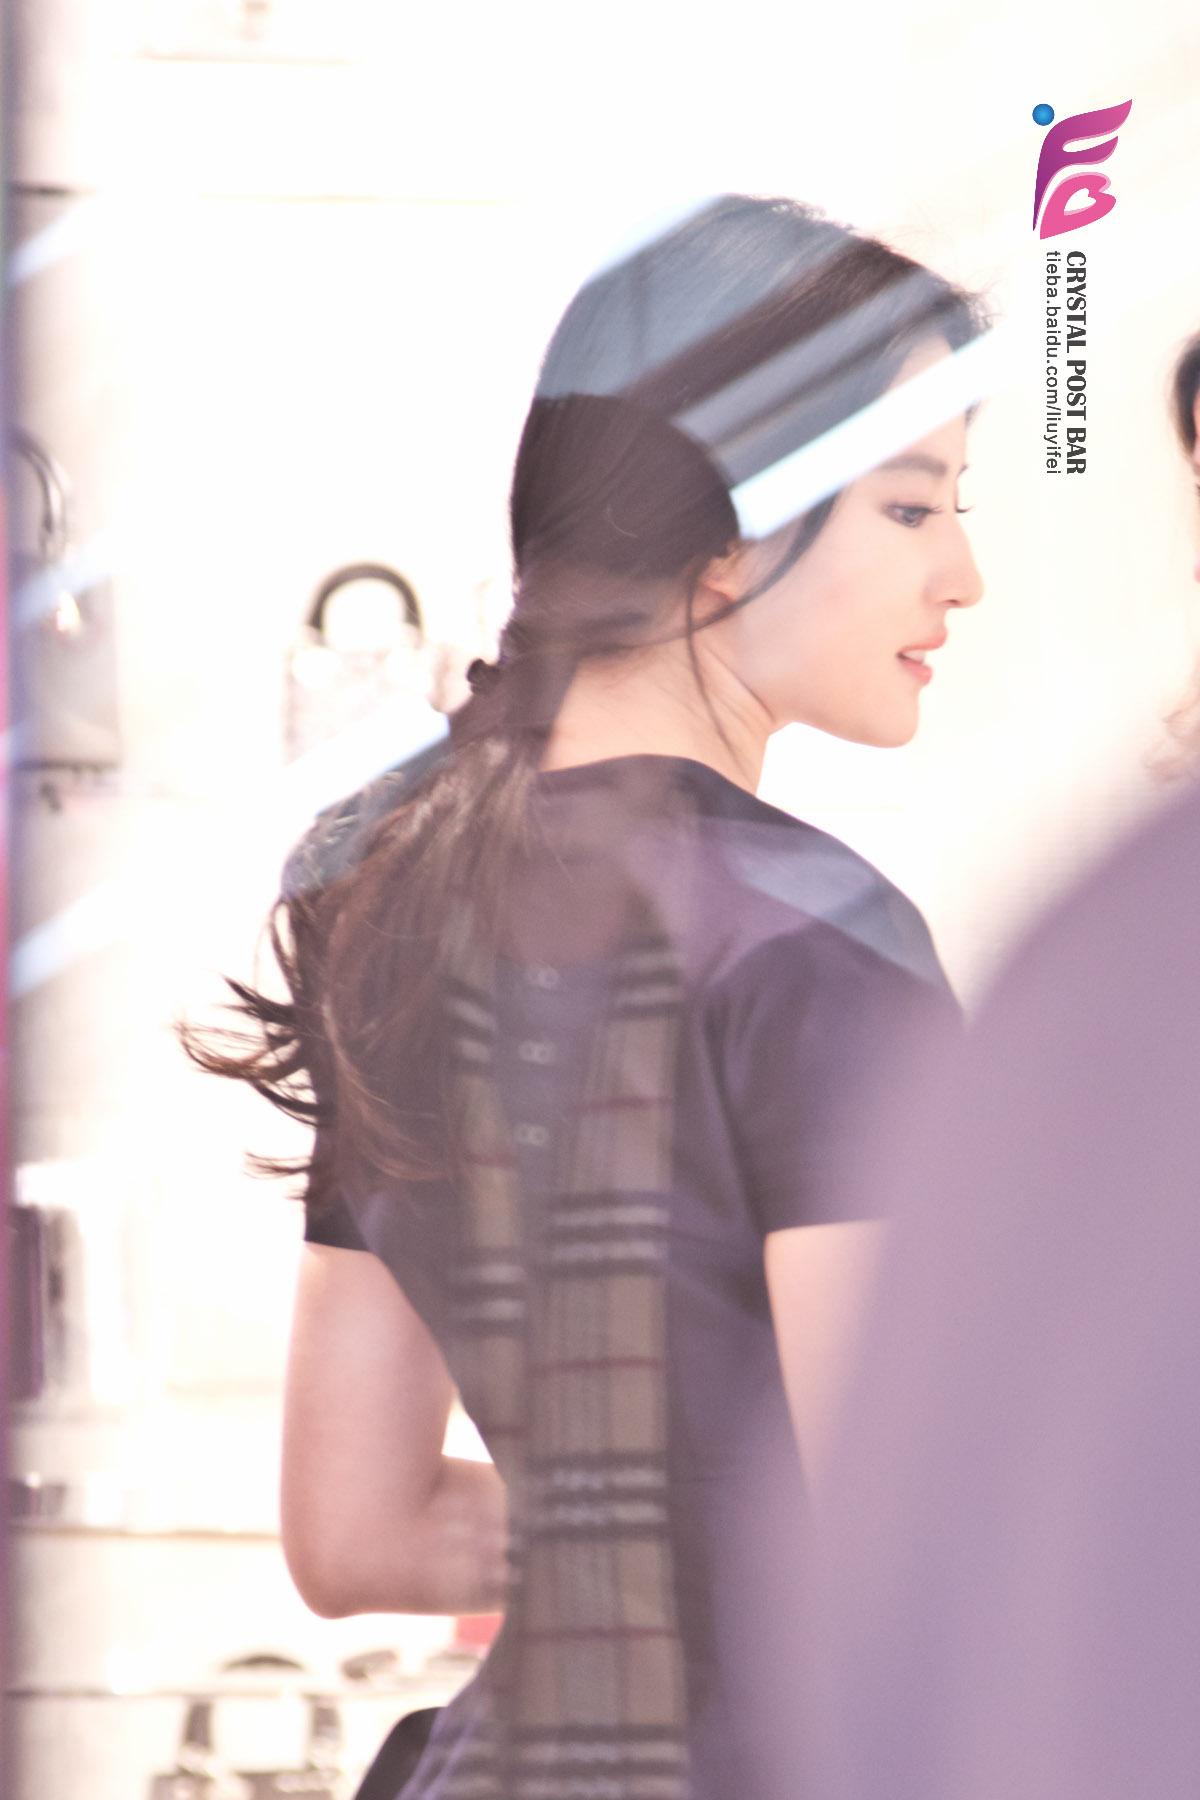 Dior国贸旗舰店开幕  《刘亦菲》[2015.12.19]